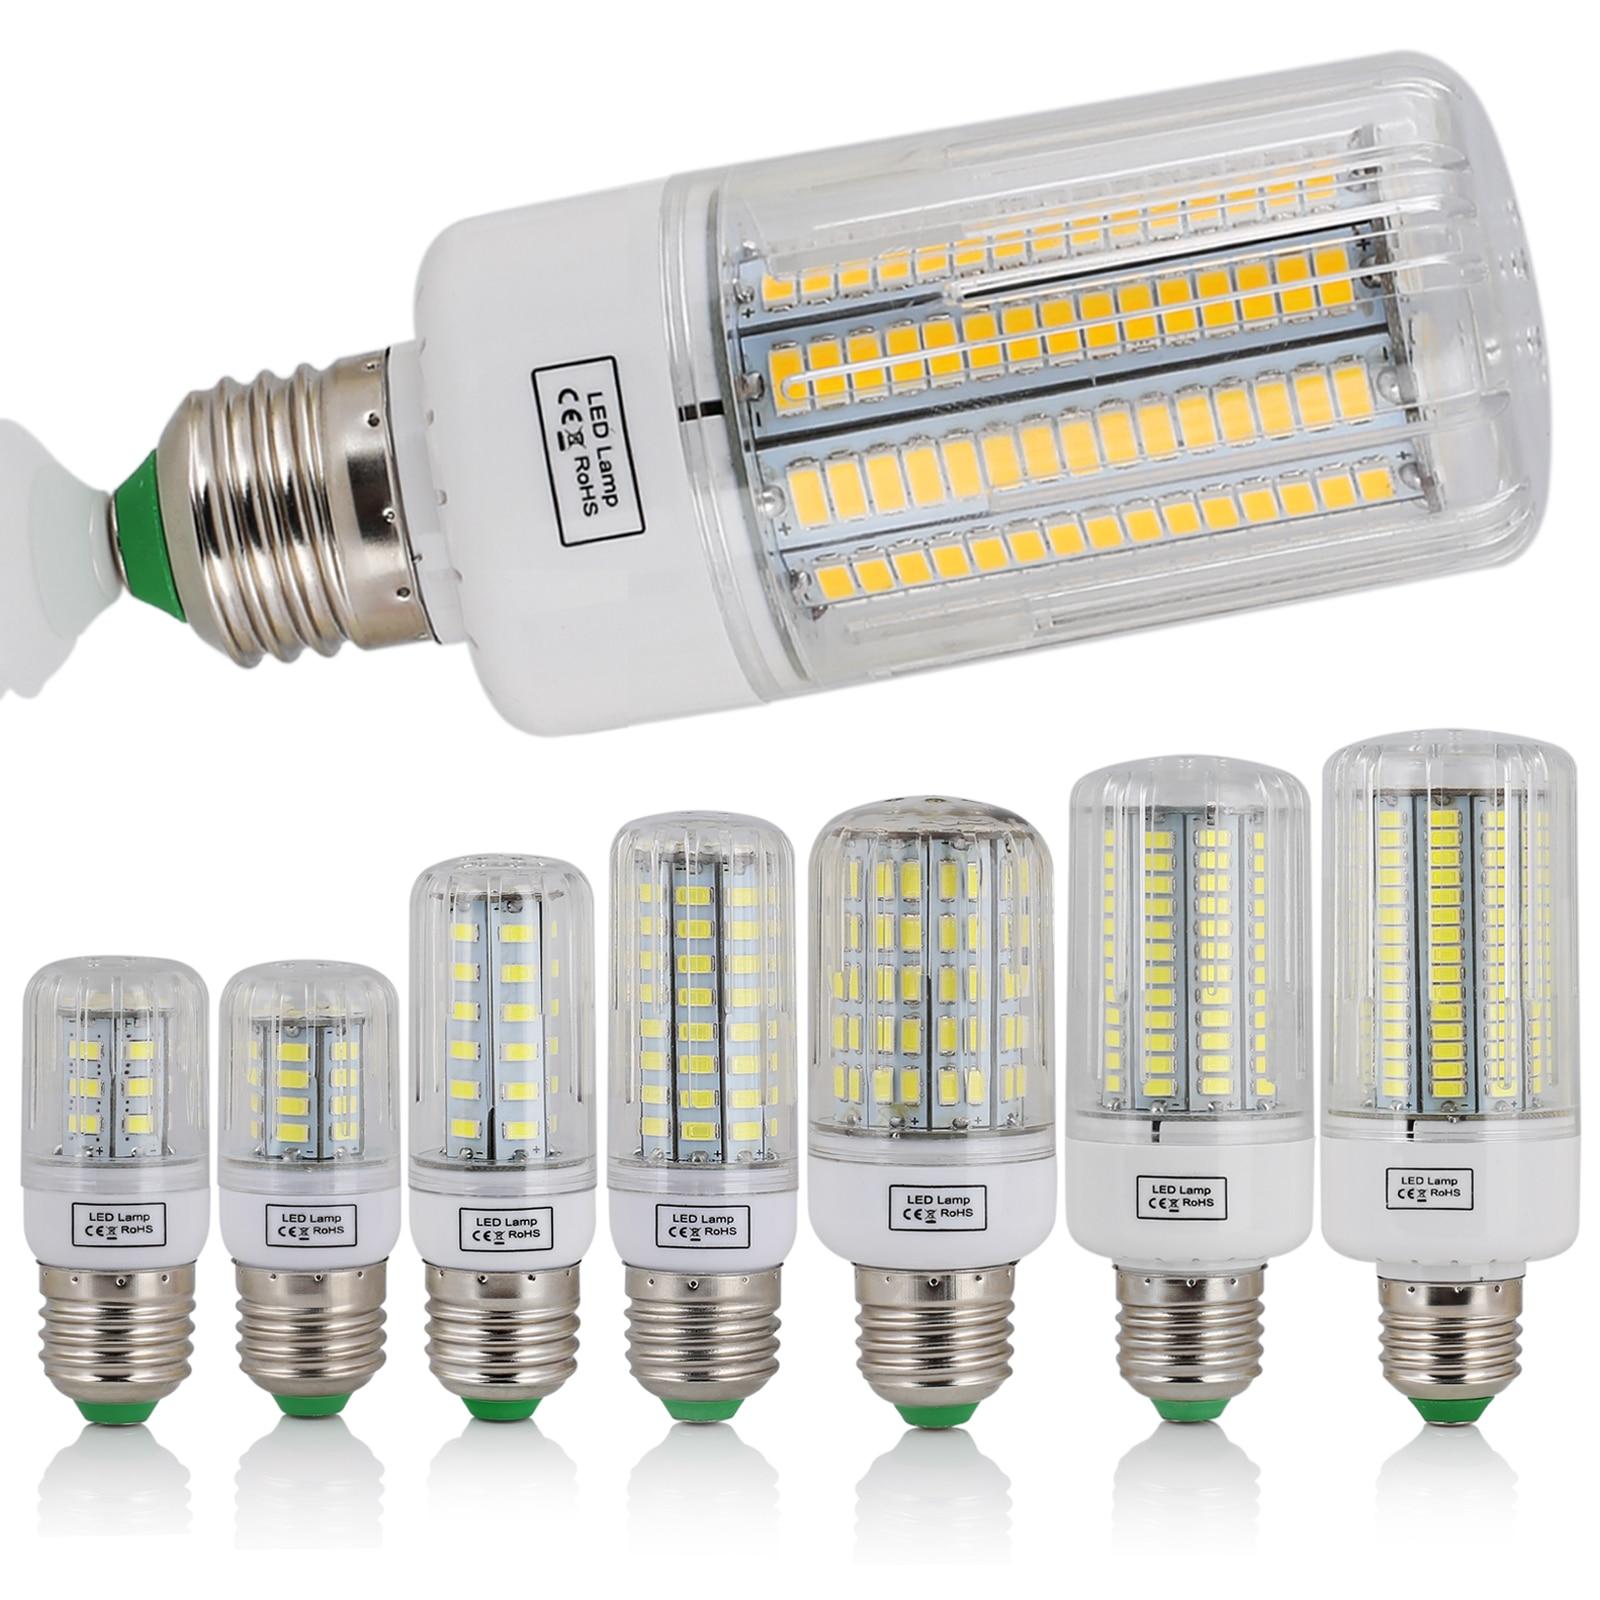 LED Corn Light Bulbs E27 Screw Base SMD 5730 7W 12W - 30W 45W Ultra Bright Home Chandelier Table Lamp 30 42 - 136 165LEDs 220V